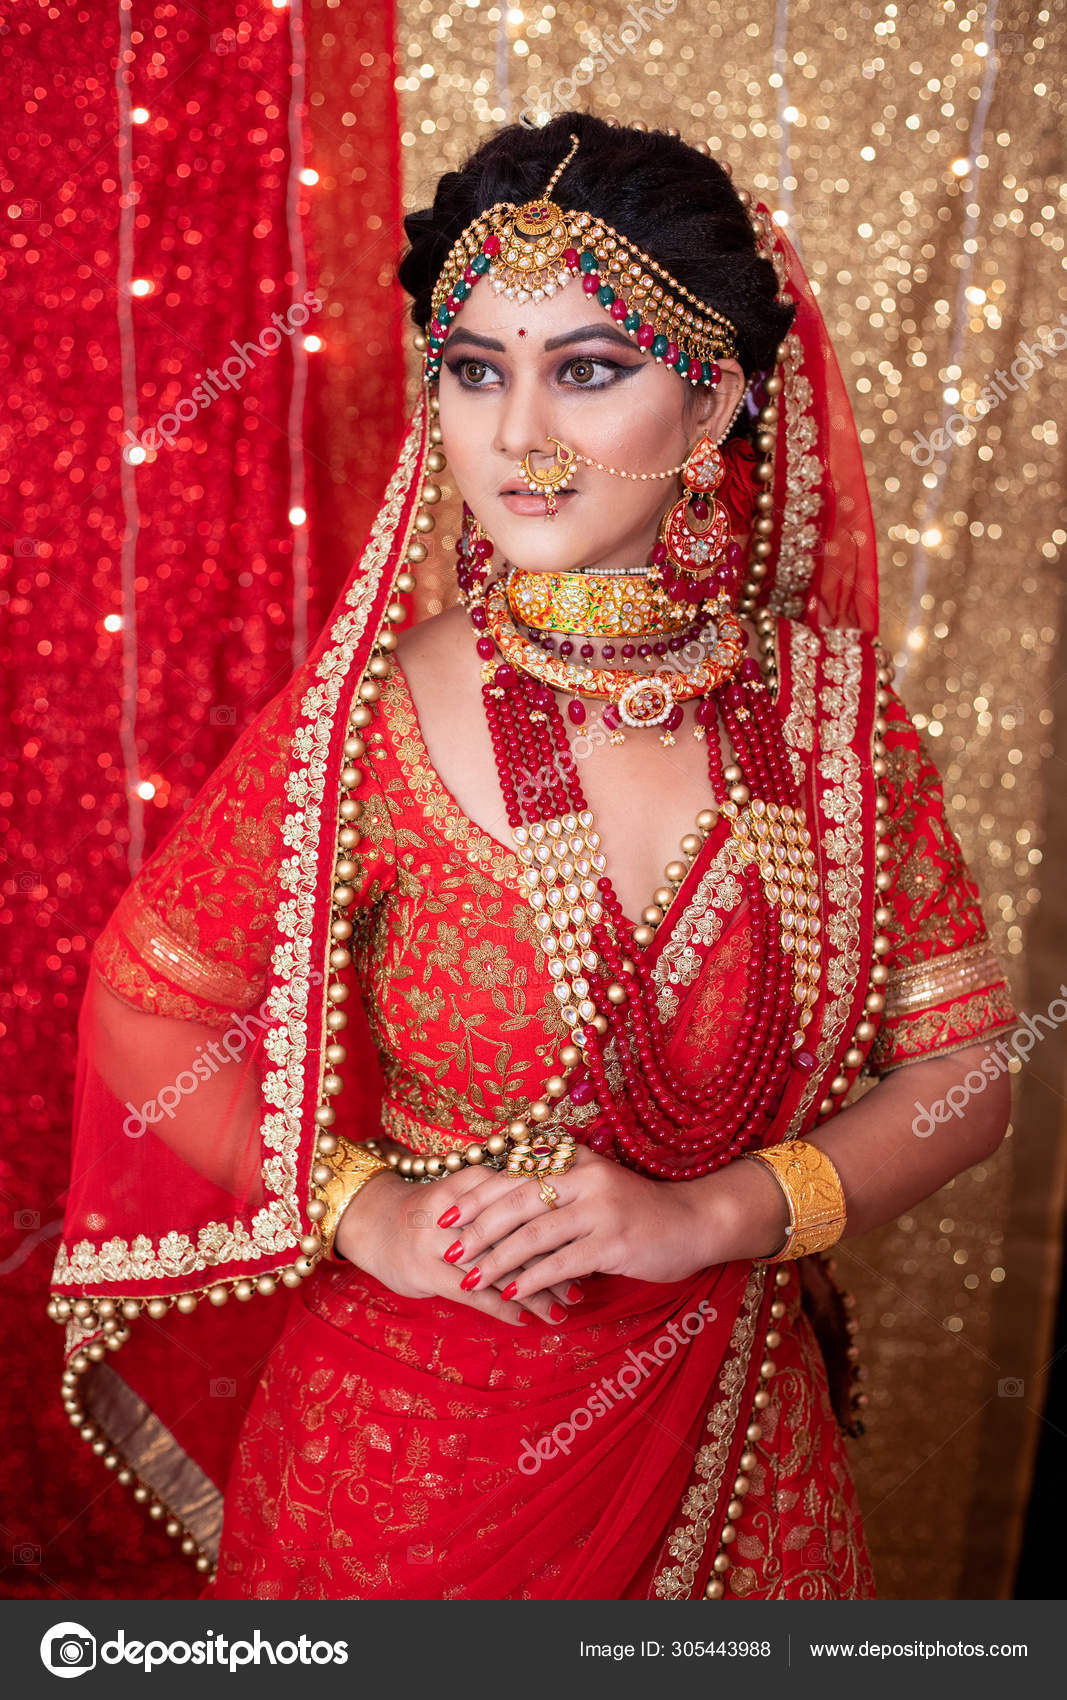 Pakistani Indian Bride Showing Wedding Lehenga Sharara Design